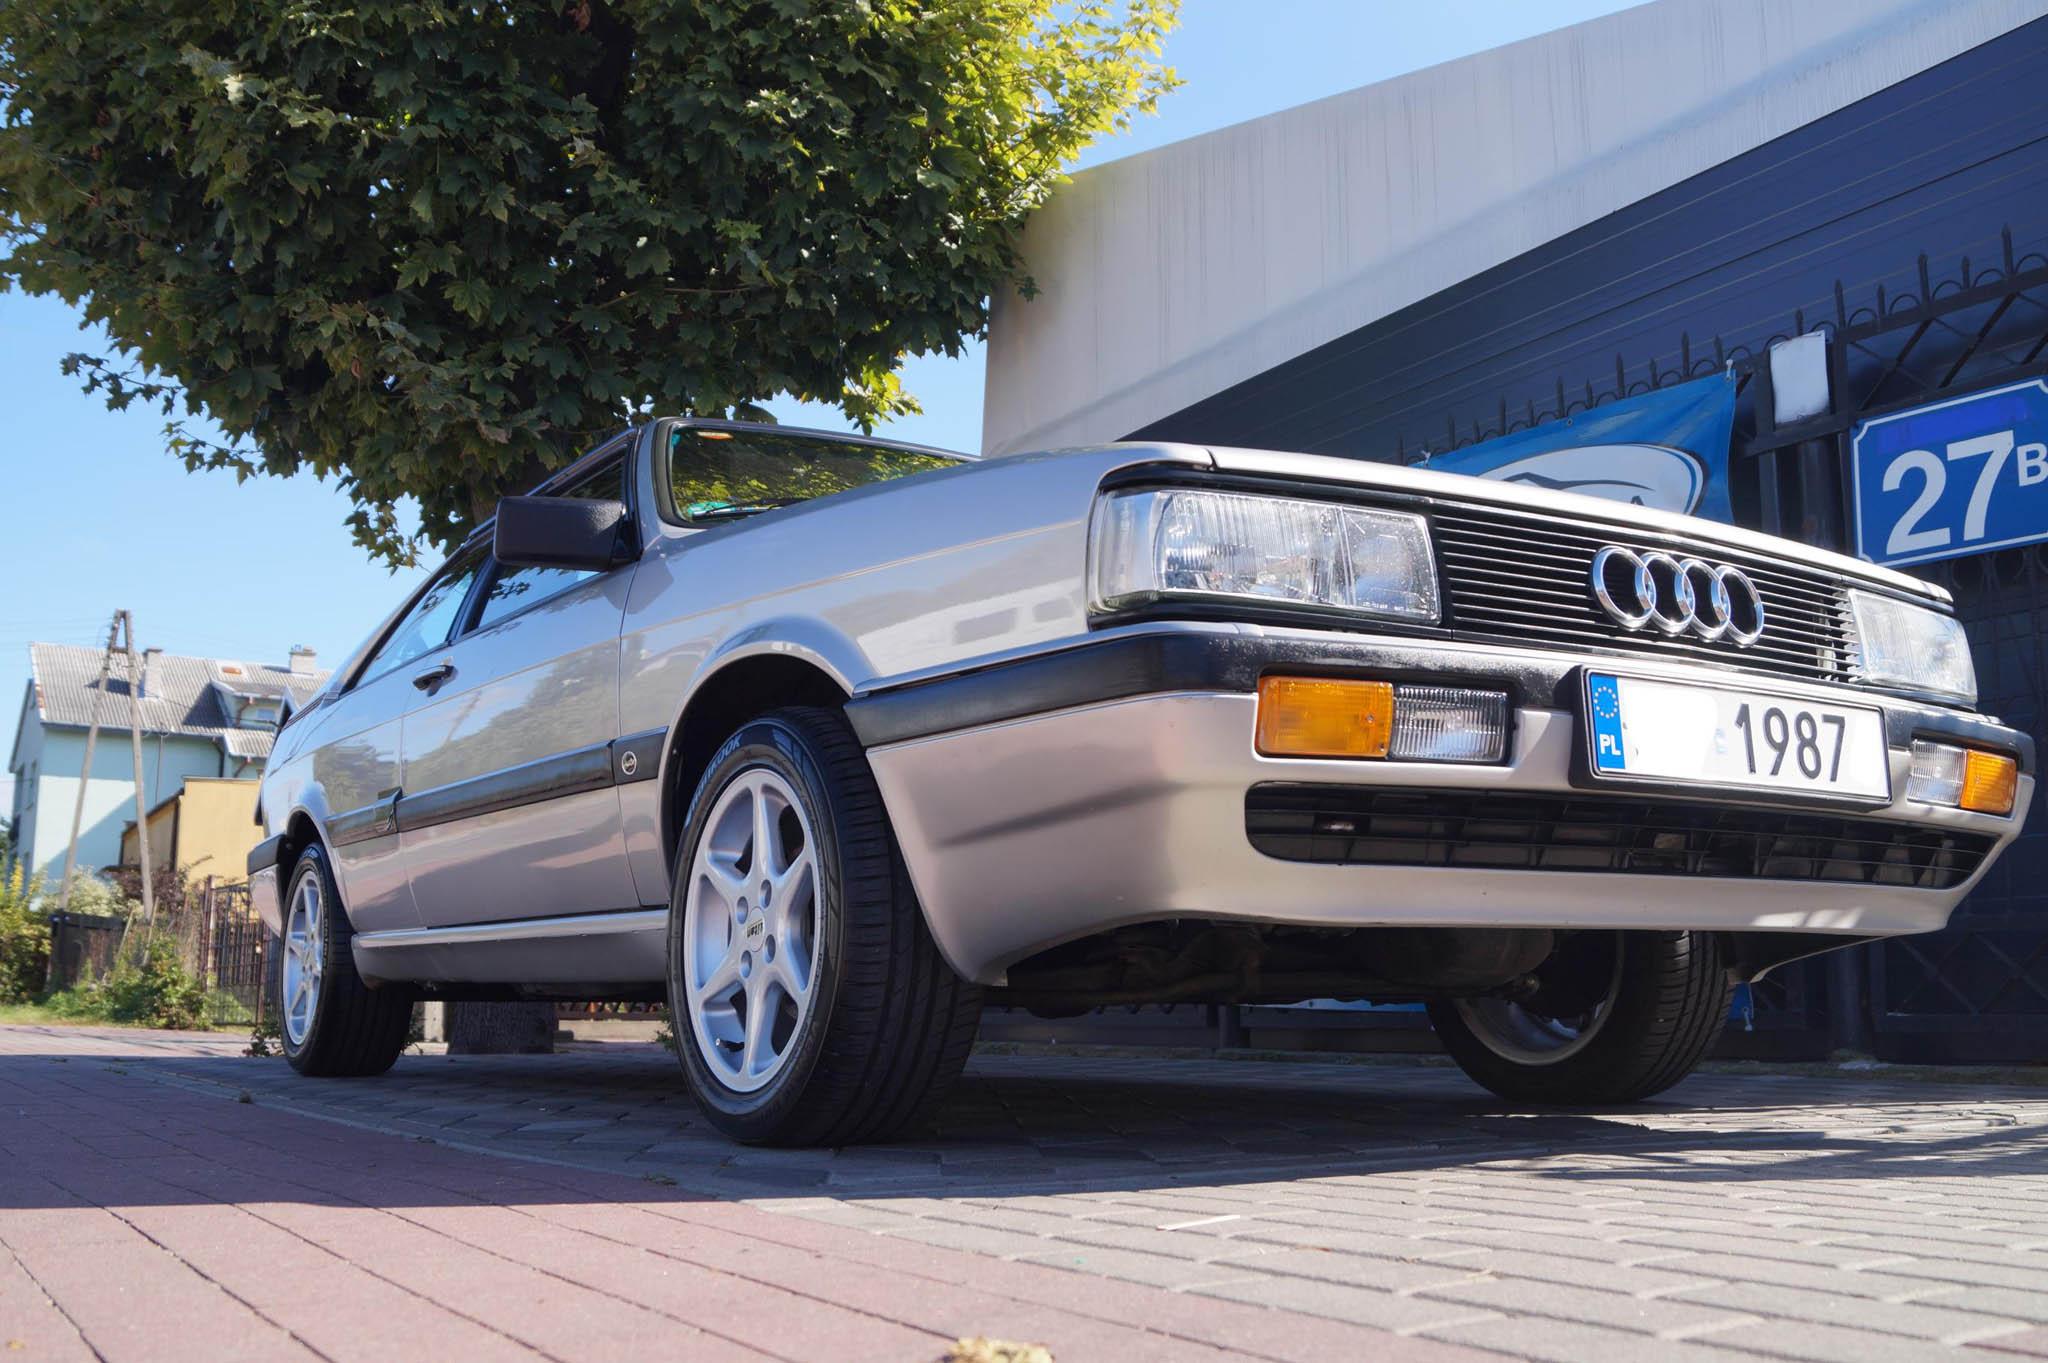 Audi Coupe GT 1987 gieldaklasykow pl audi-coupe-gt-08